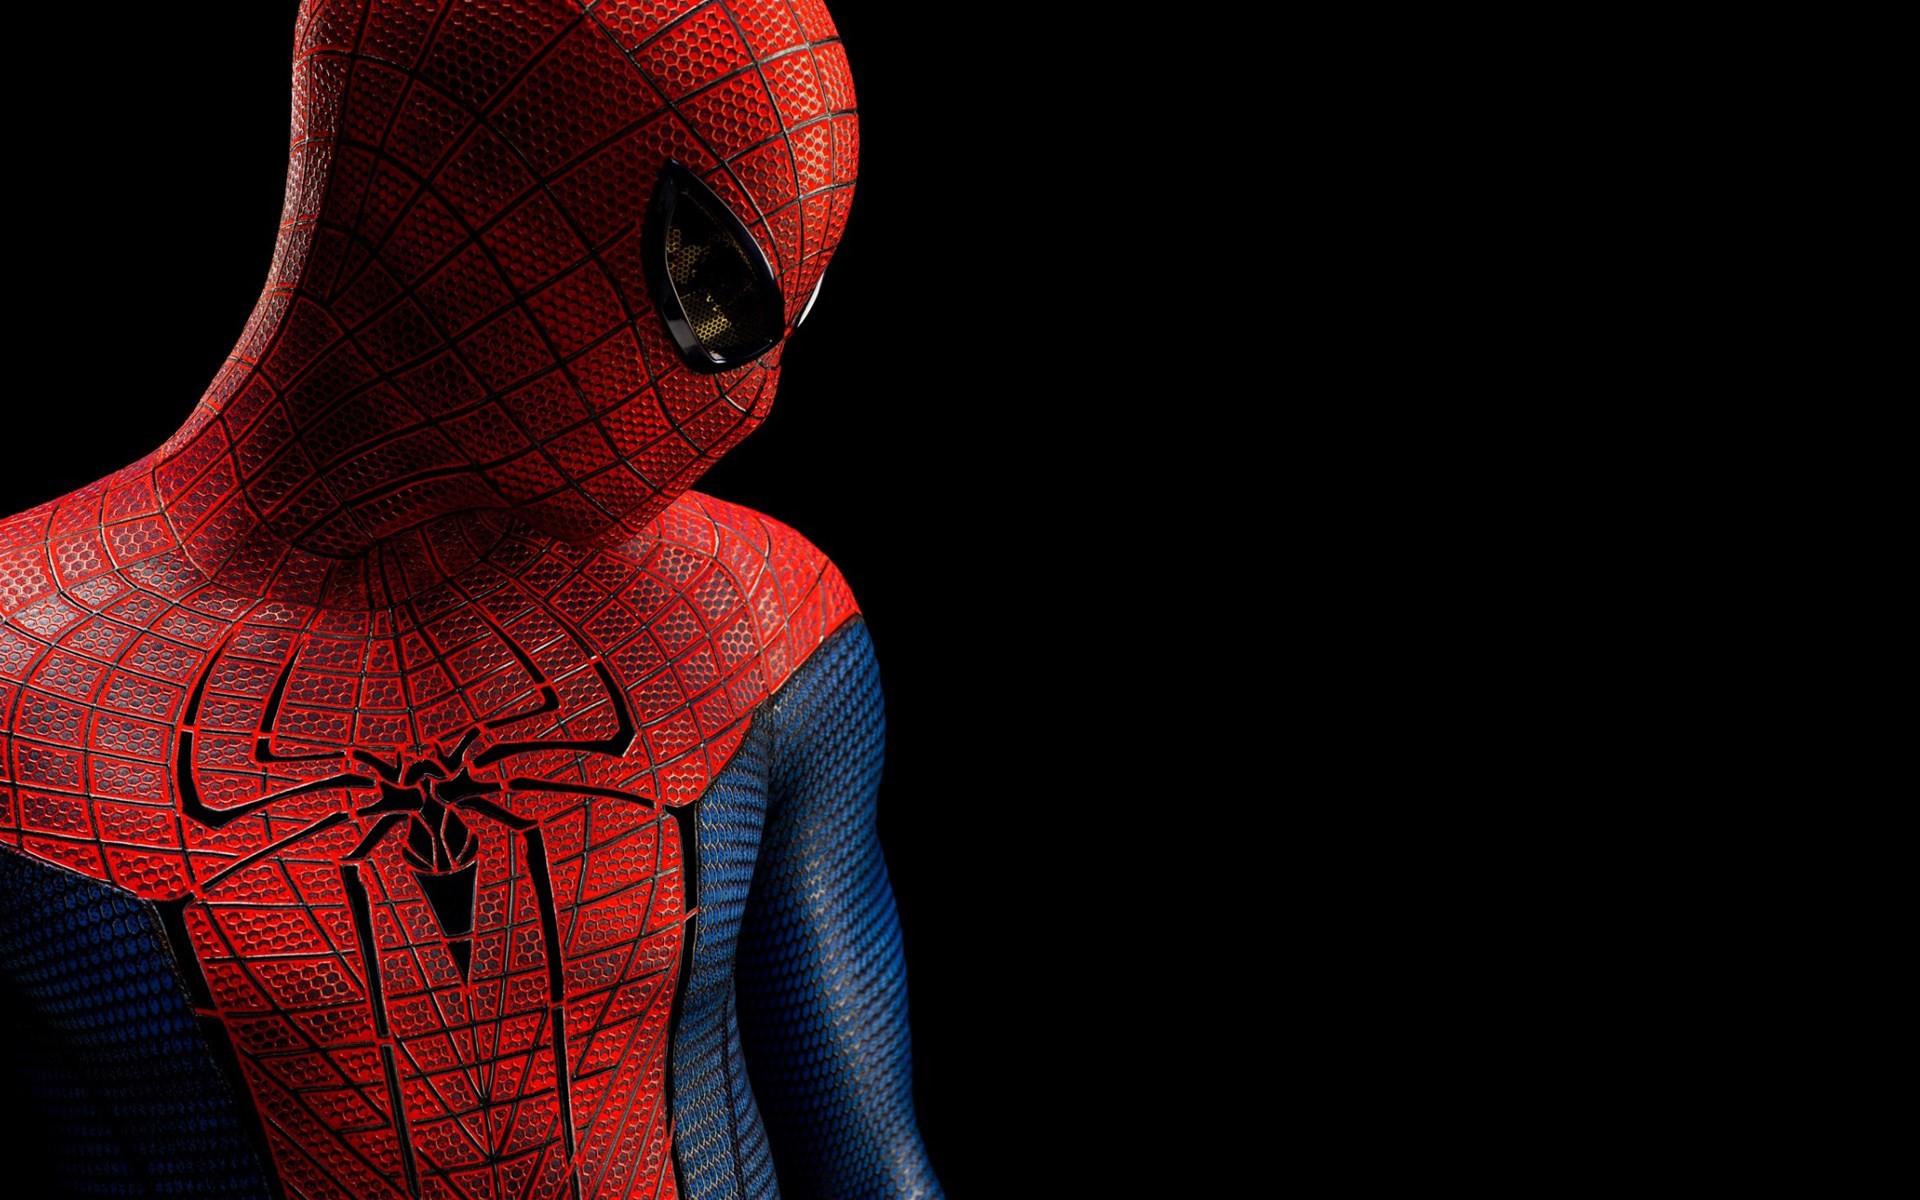 spiderman wallpaper pack 1080p hd